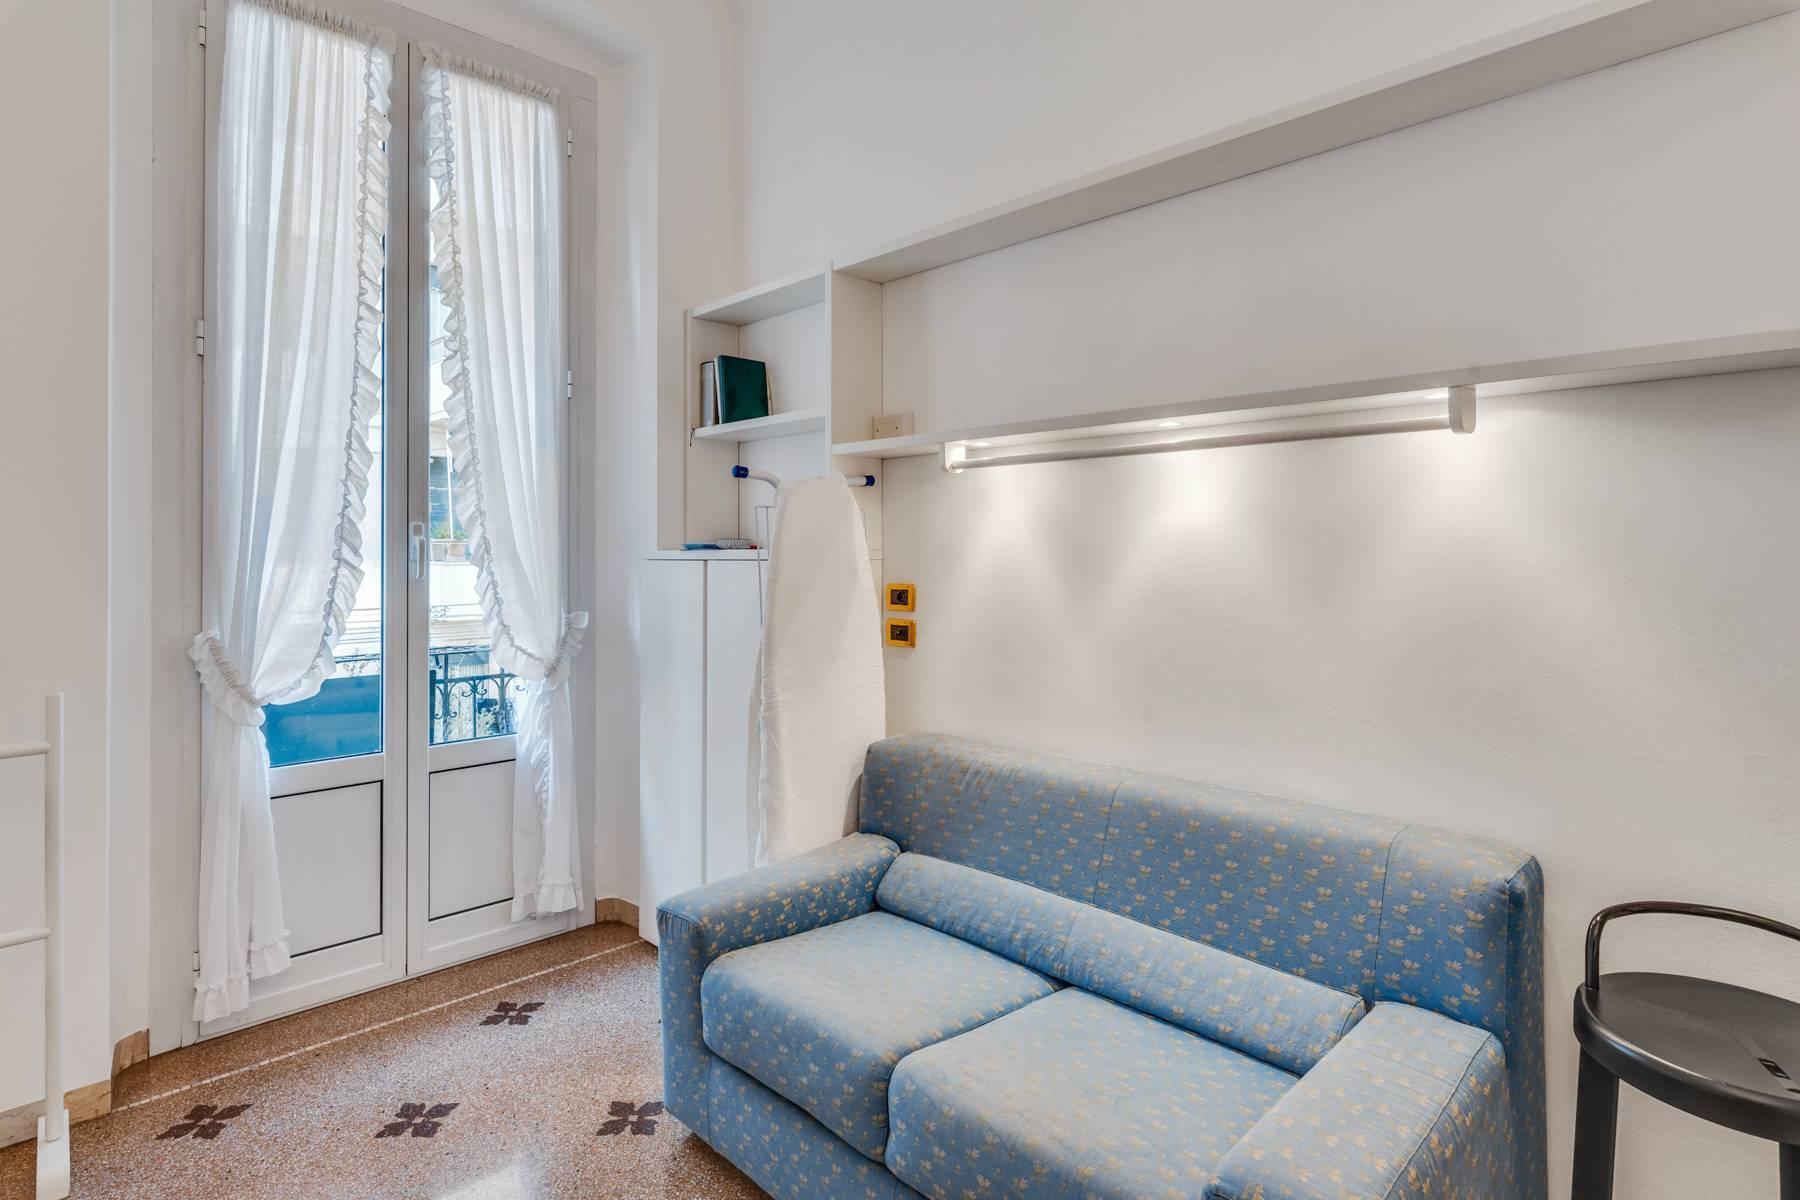 Prestigious 275 sqm apartment inside a period building in Carignano - 26